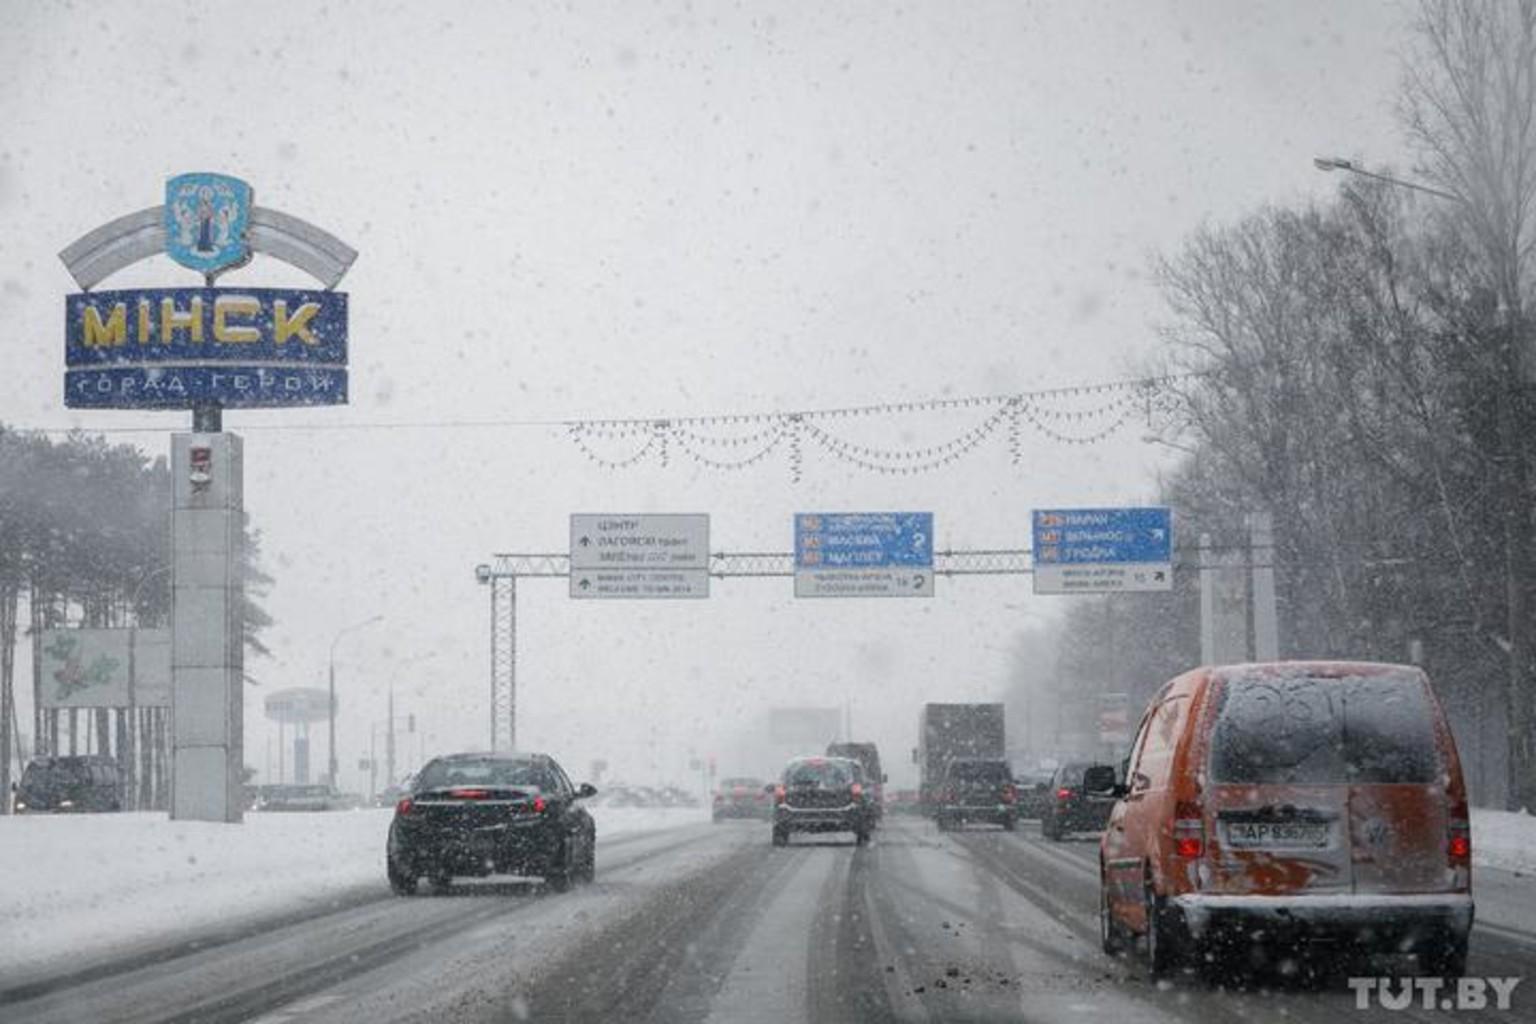 Snegopad doroga 20180302 shuk tutby phsl 9396